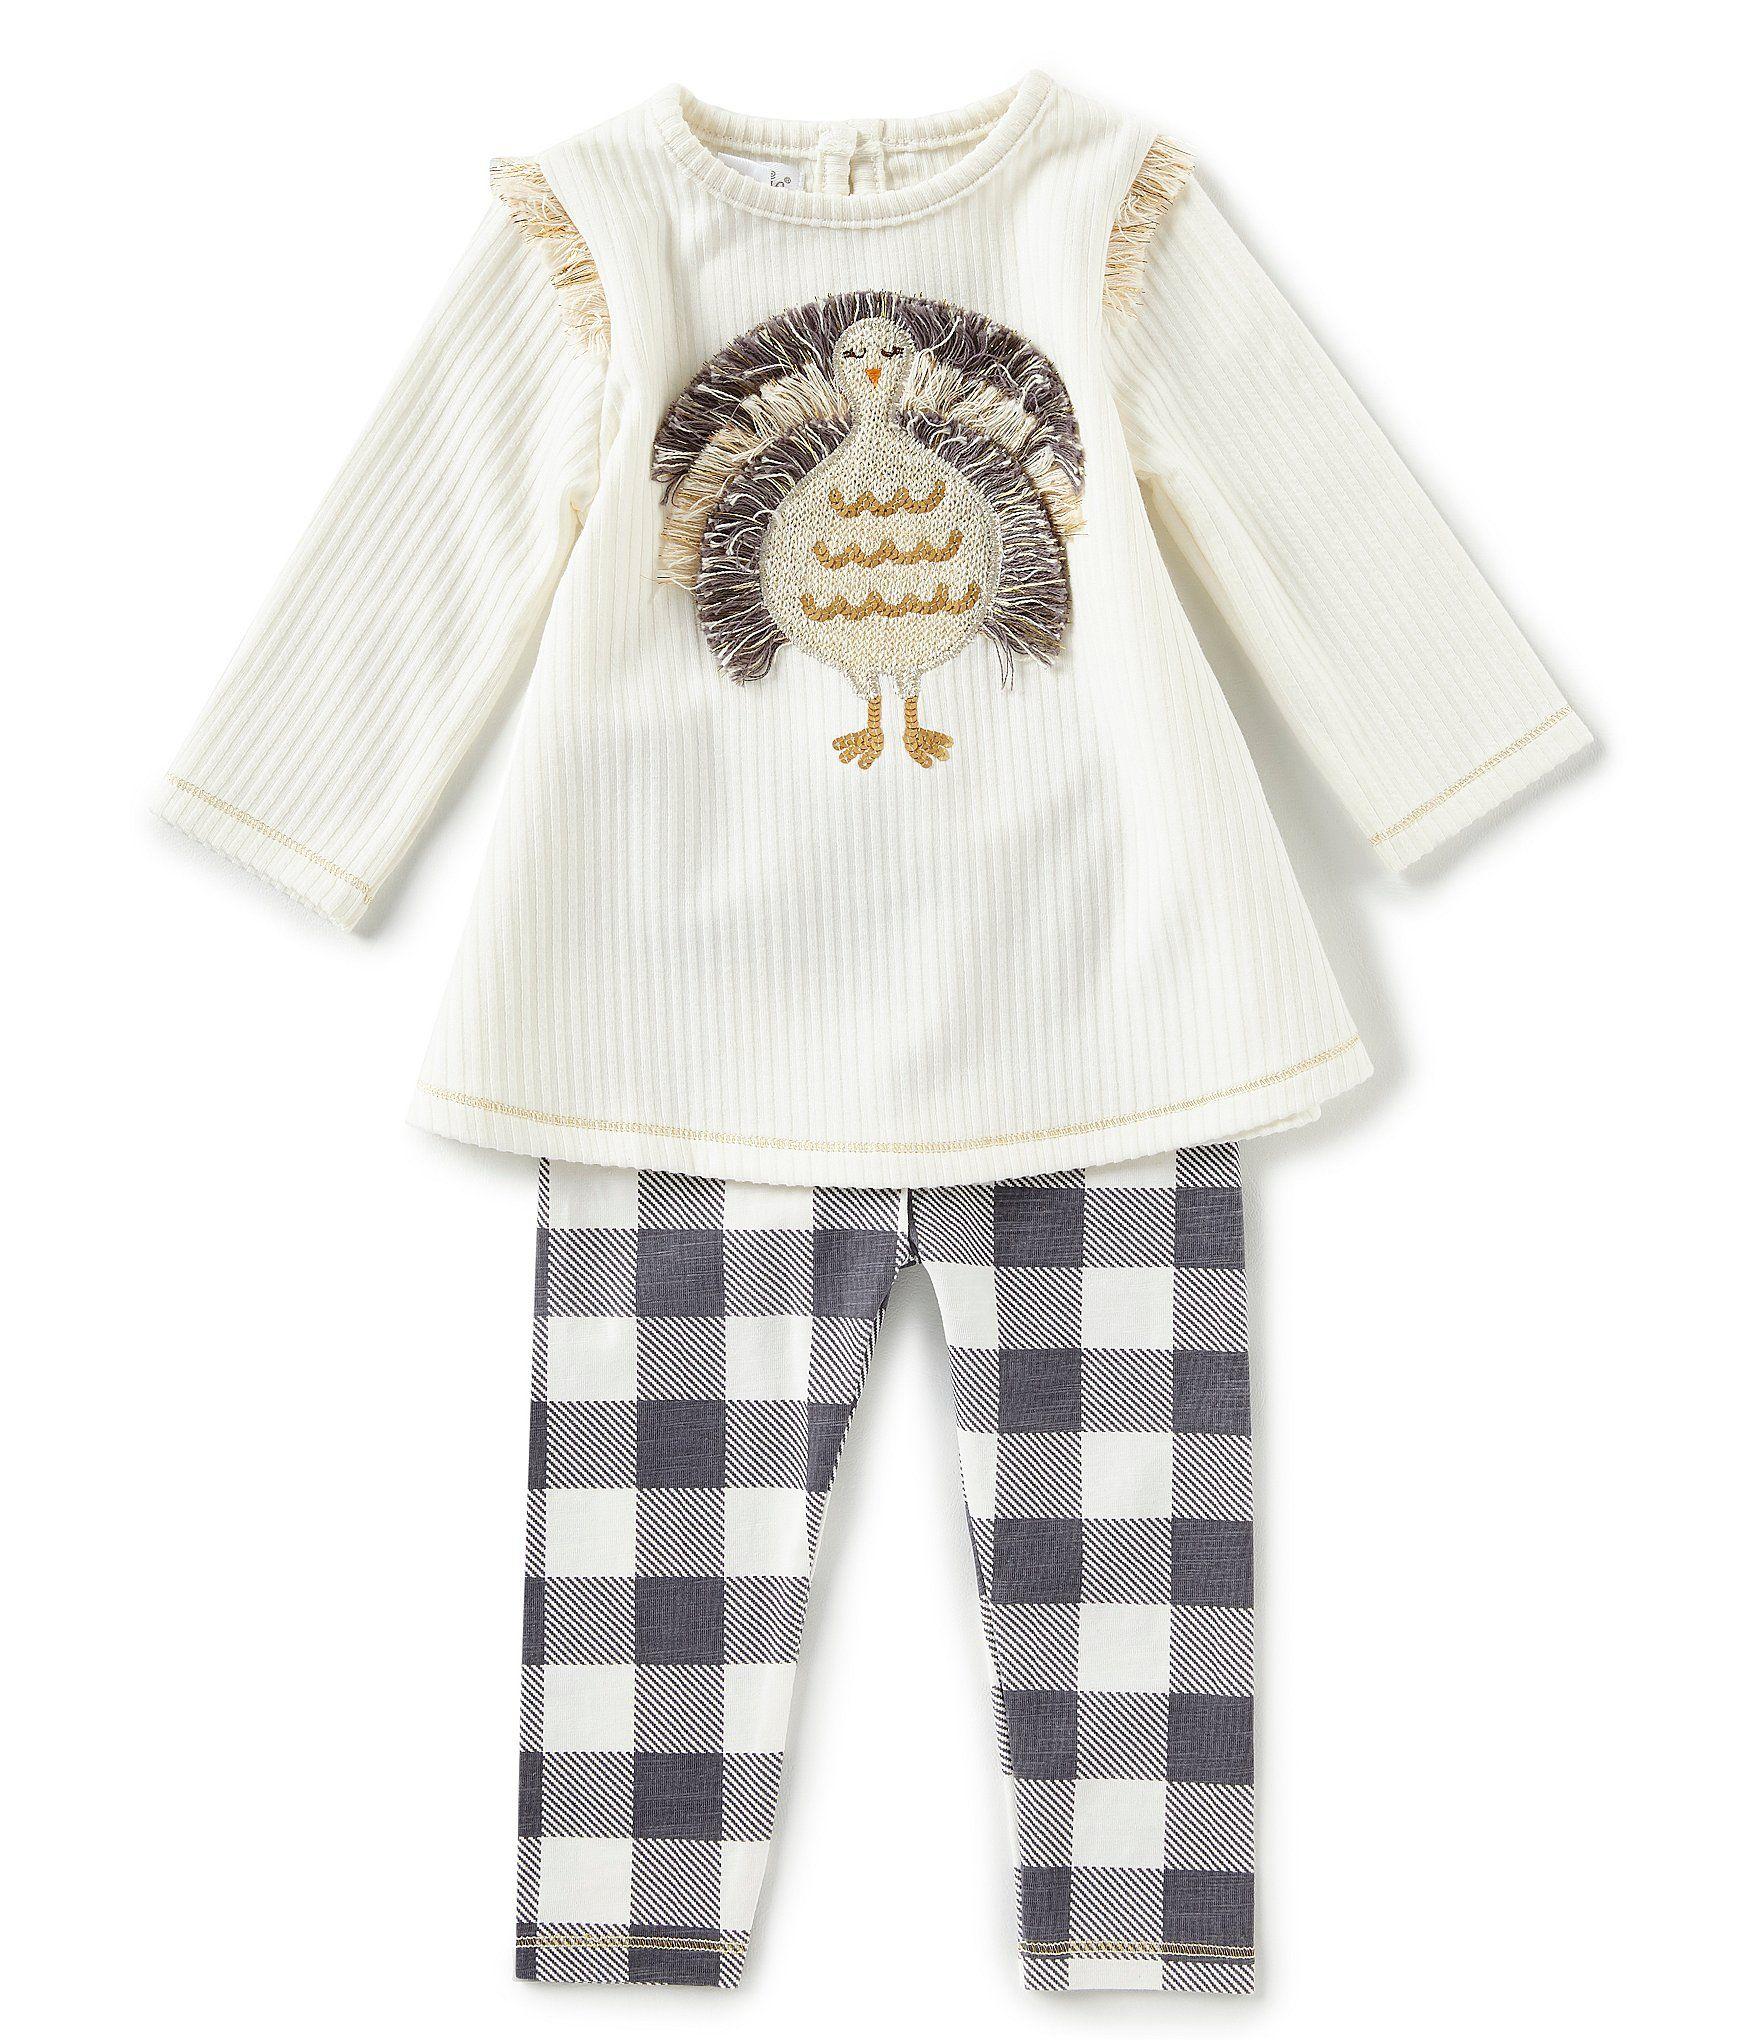 aecee5f1c Mud Pie Baby Girls 3-18 Months Thanksgiving Turkey-Appliqued Tunic ...